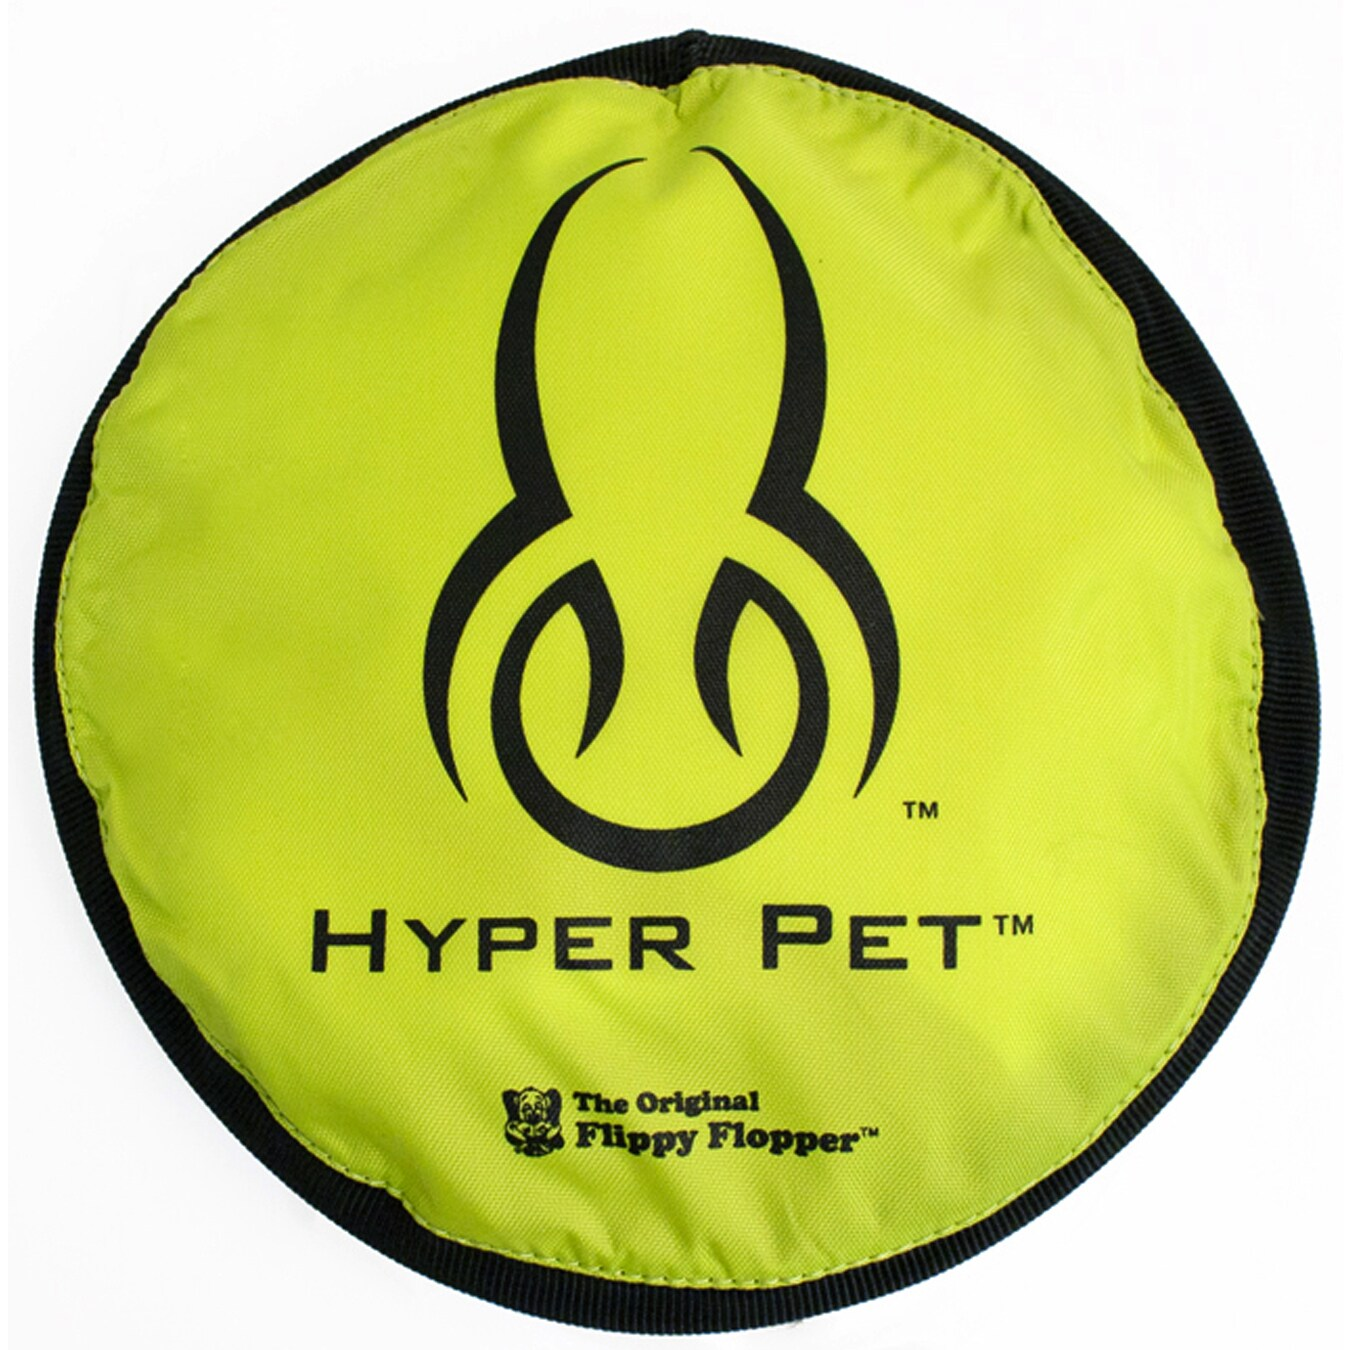 Hyper Pet Flippy Flopper 9 inch Dog Toy (Camo (Green))